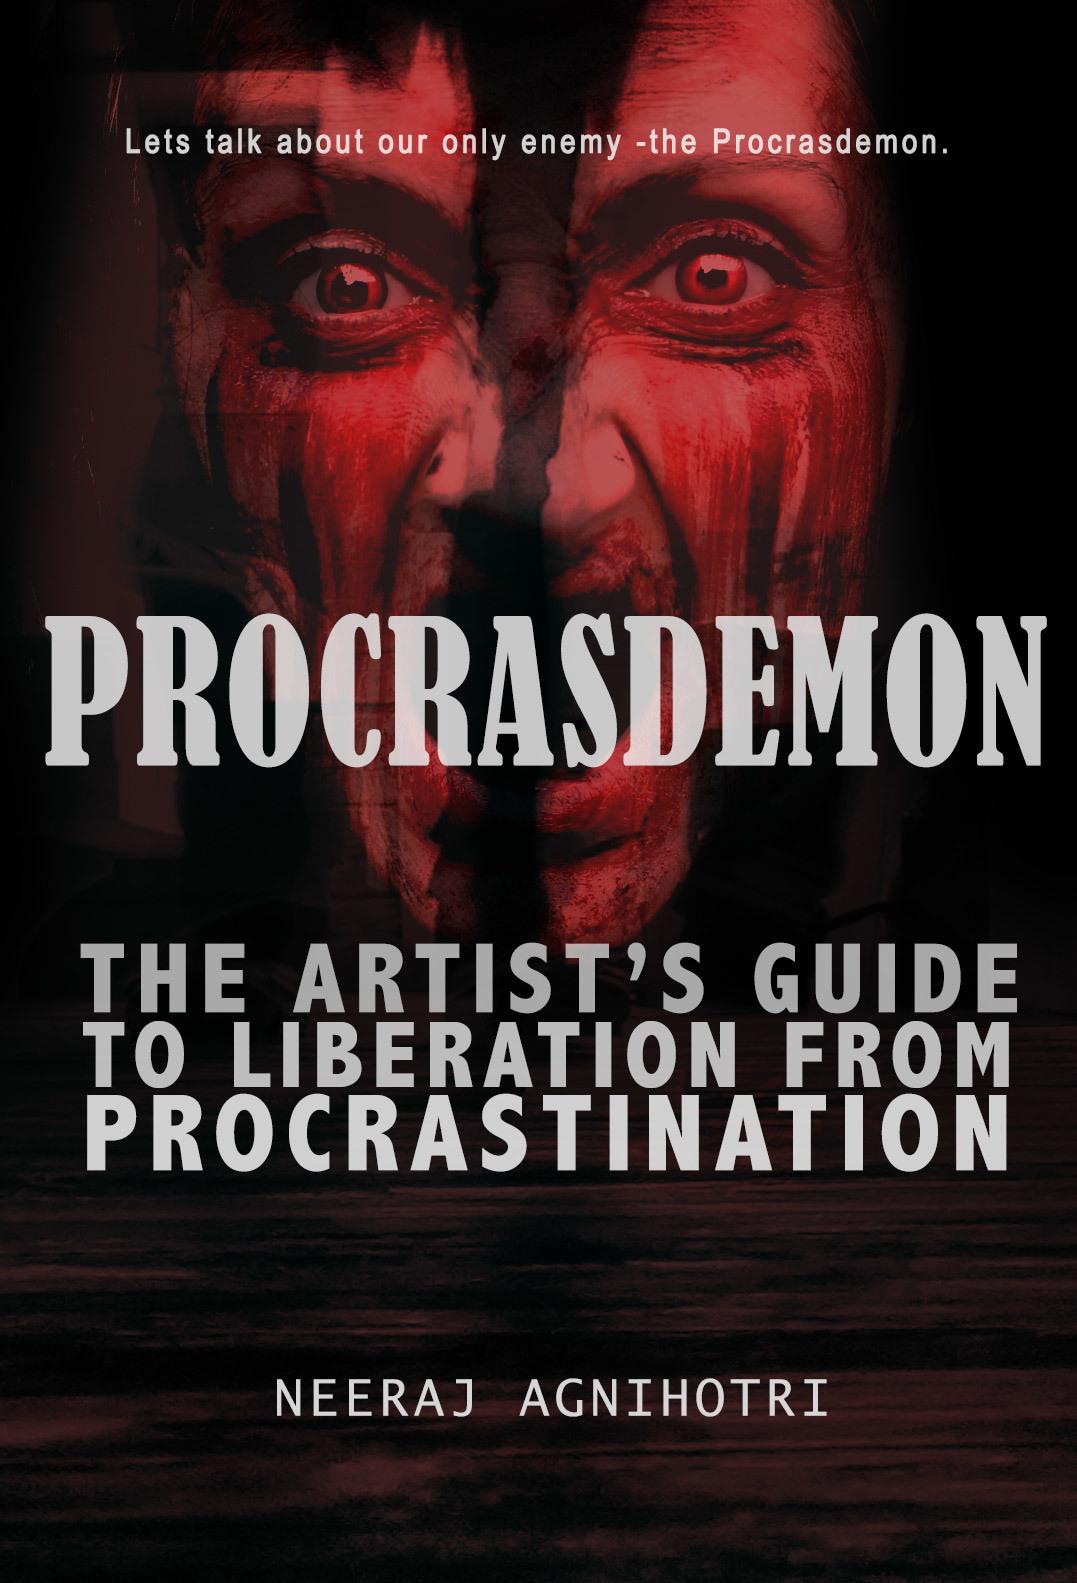 Procrasdemon - The Artist's Guide to Liberation From Procrastination